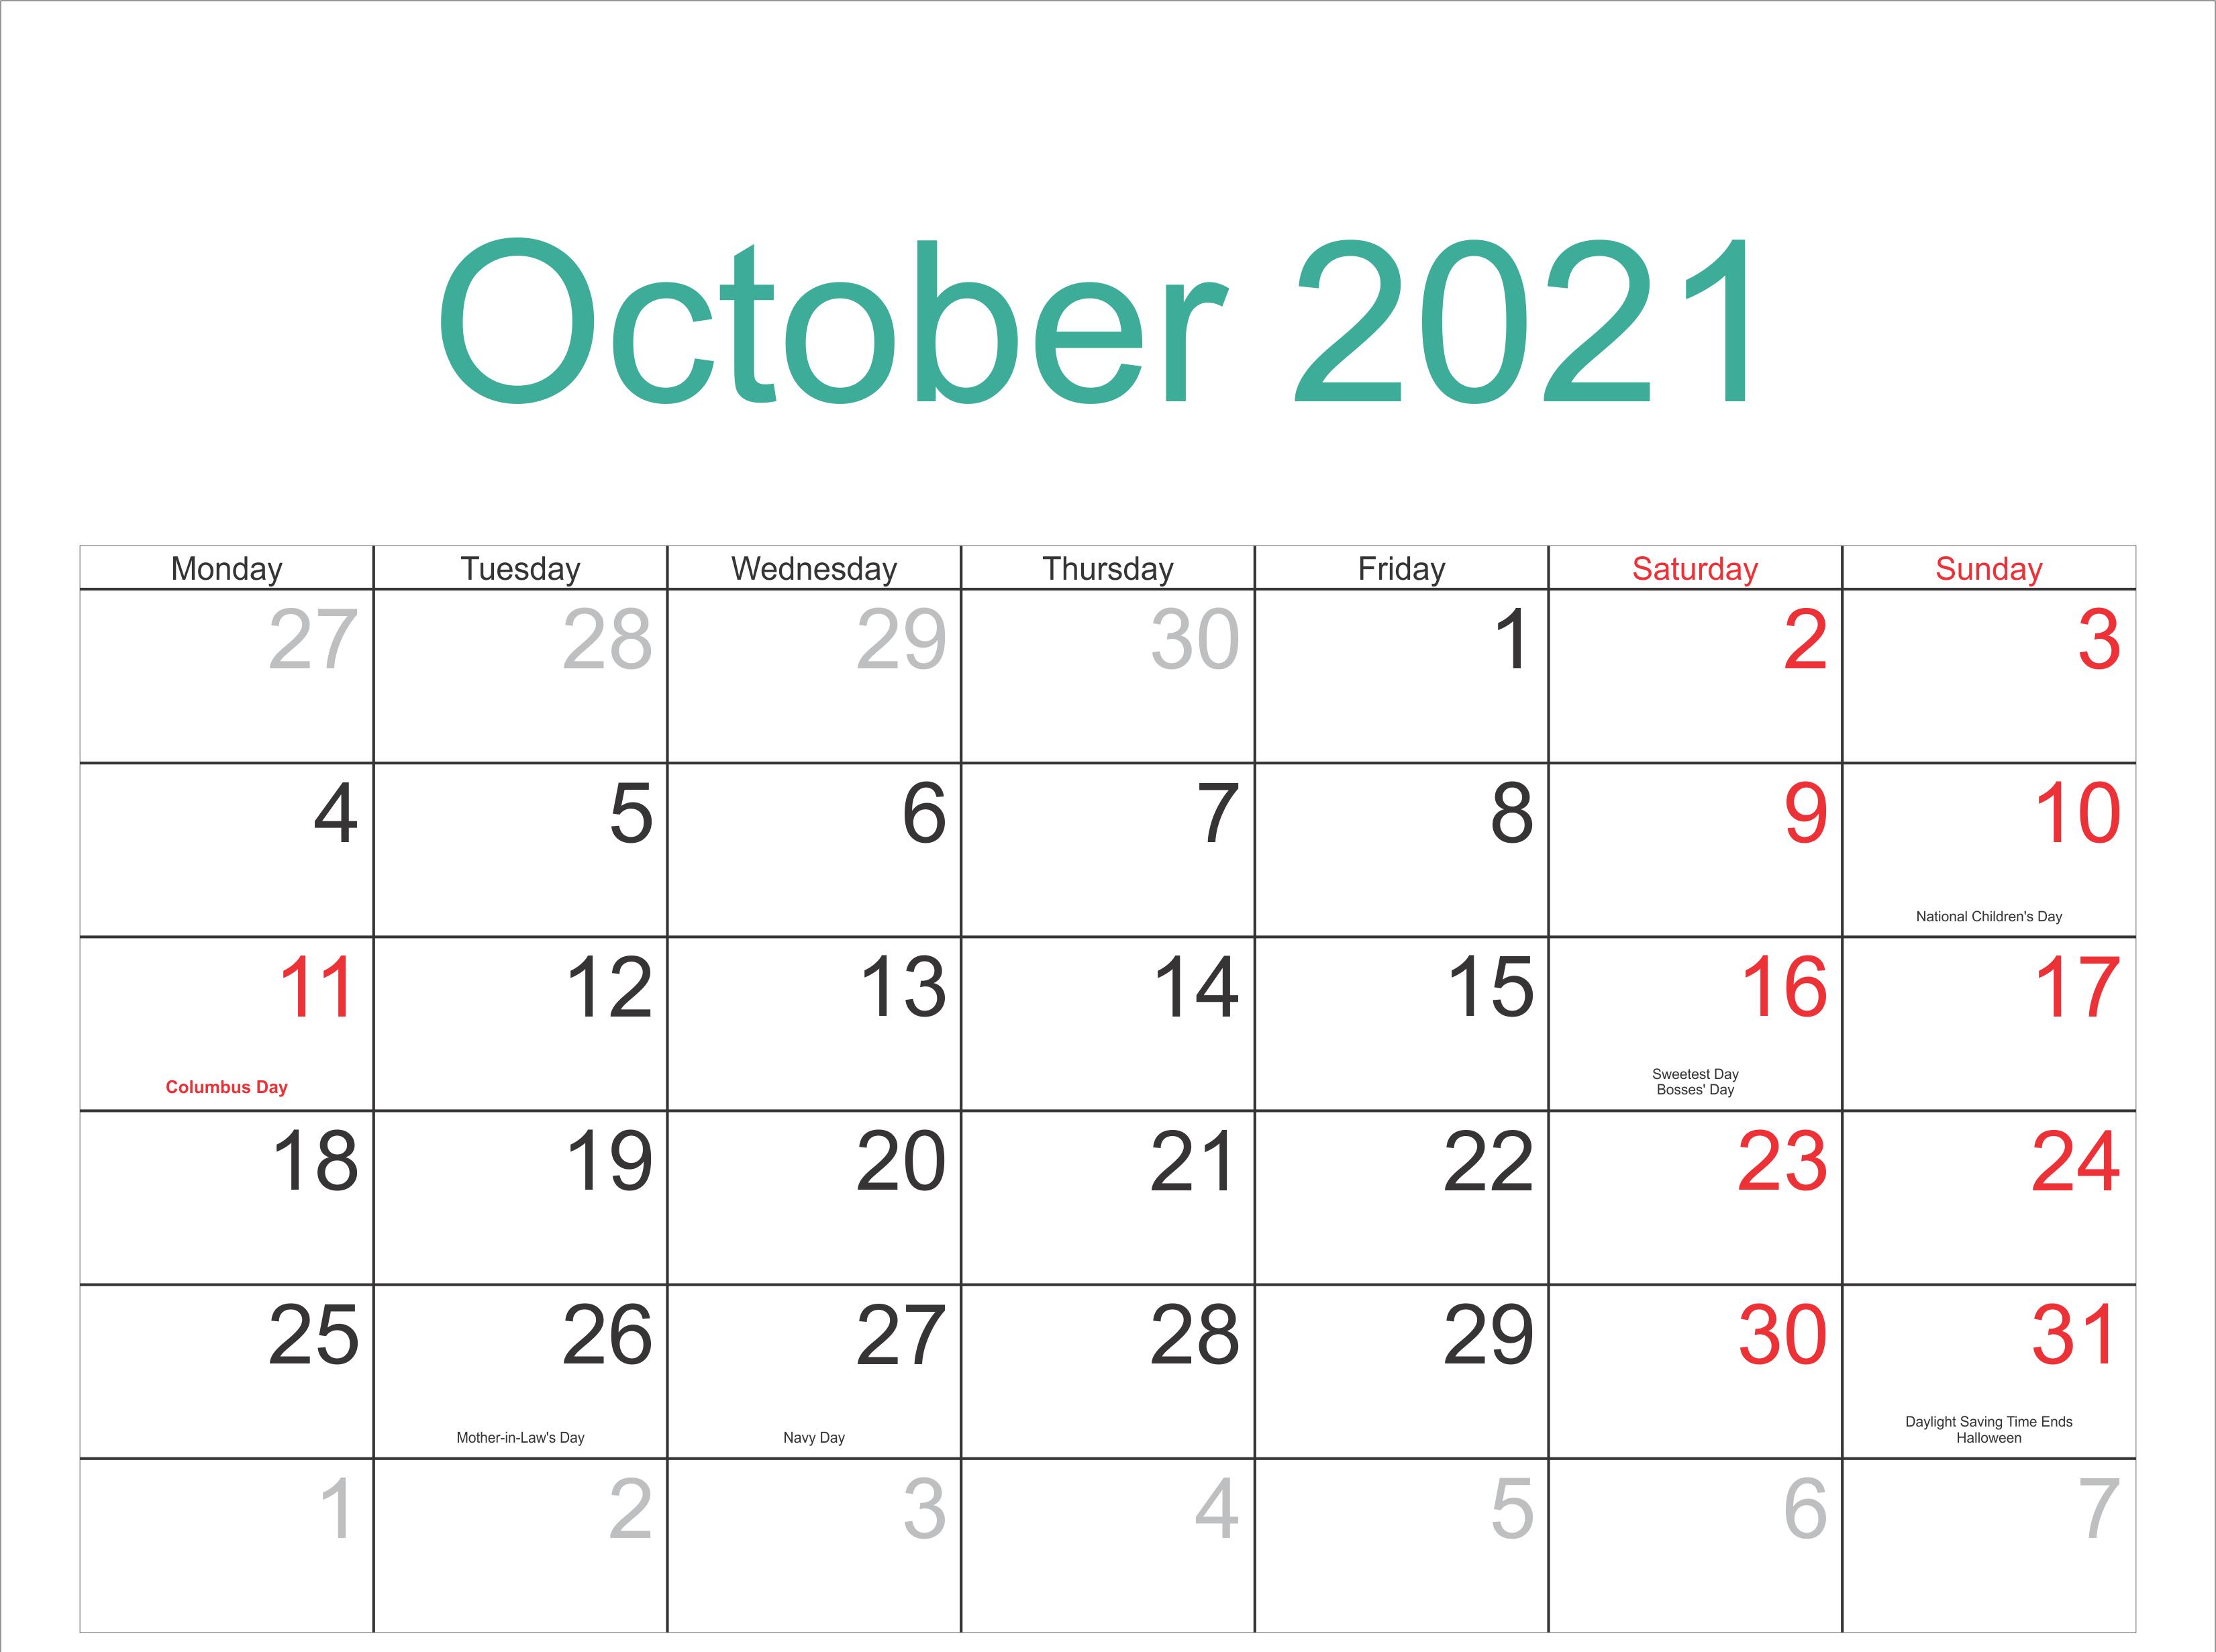 October 2021 Public Holidays Calendar